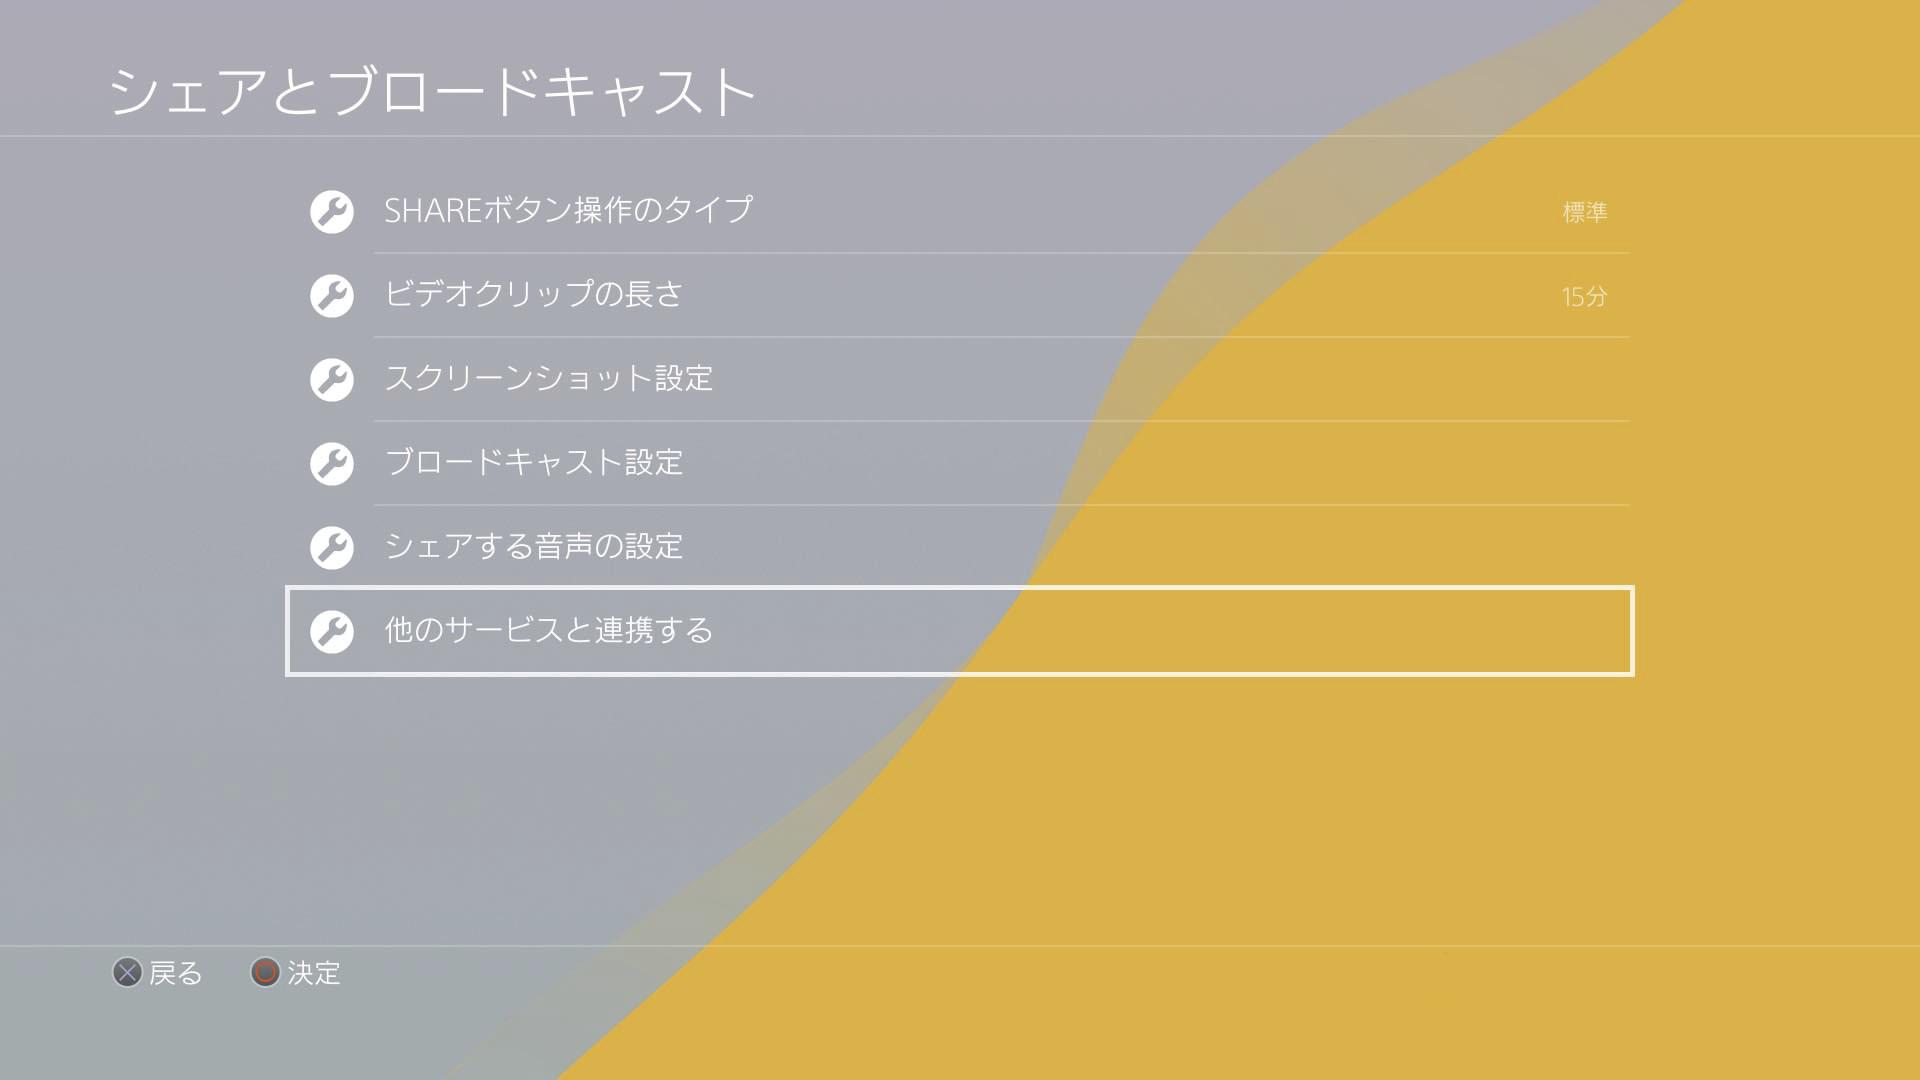 niconico-screenshot-01-ja-jp-29jan21.png